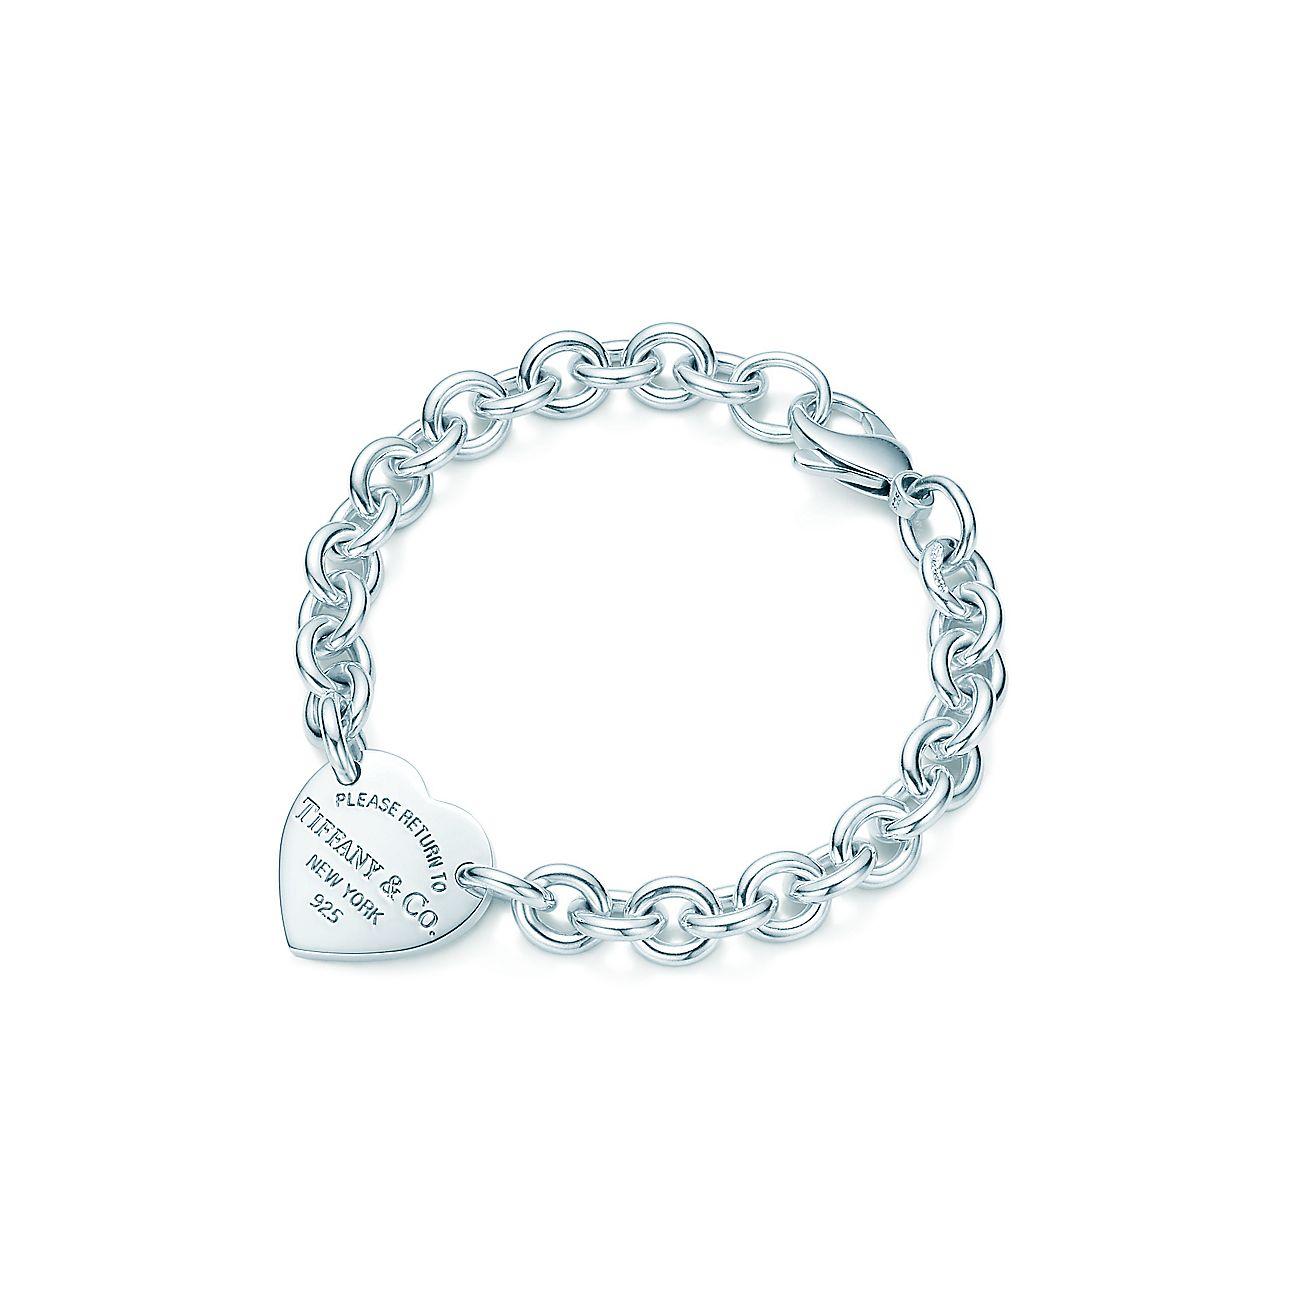 Tiffany Heart Bracelet >> Return To Tiffany Medium Heart Tag On A Bracelet In Sterling Silver